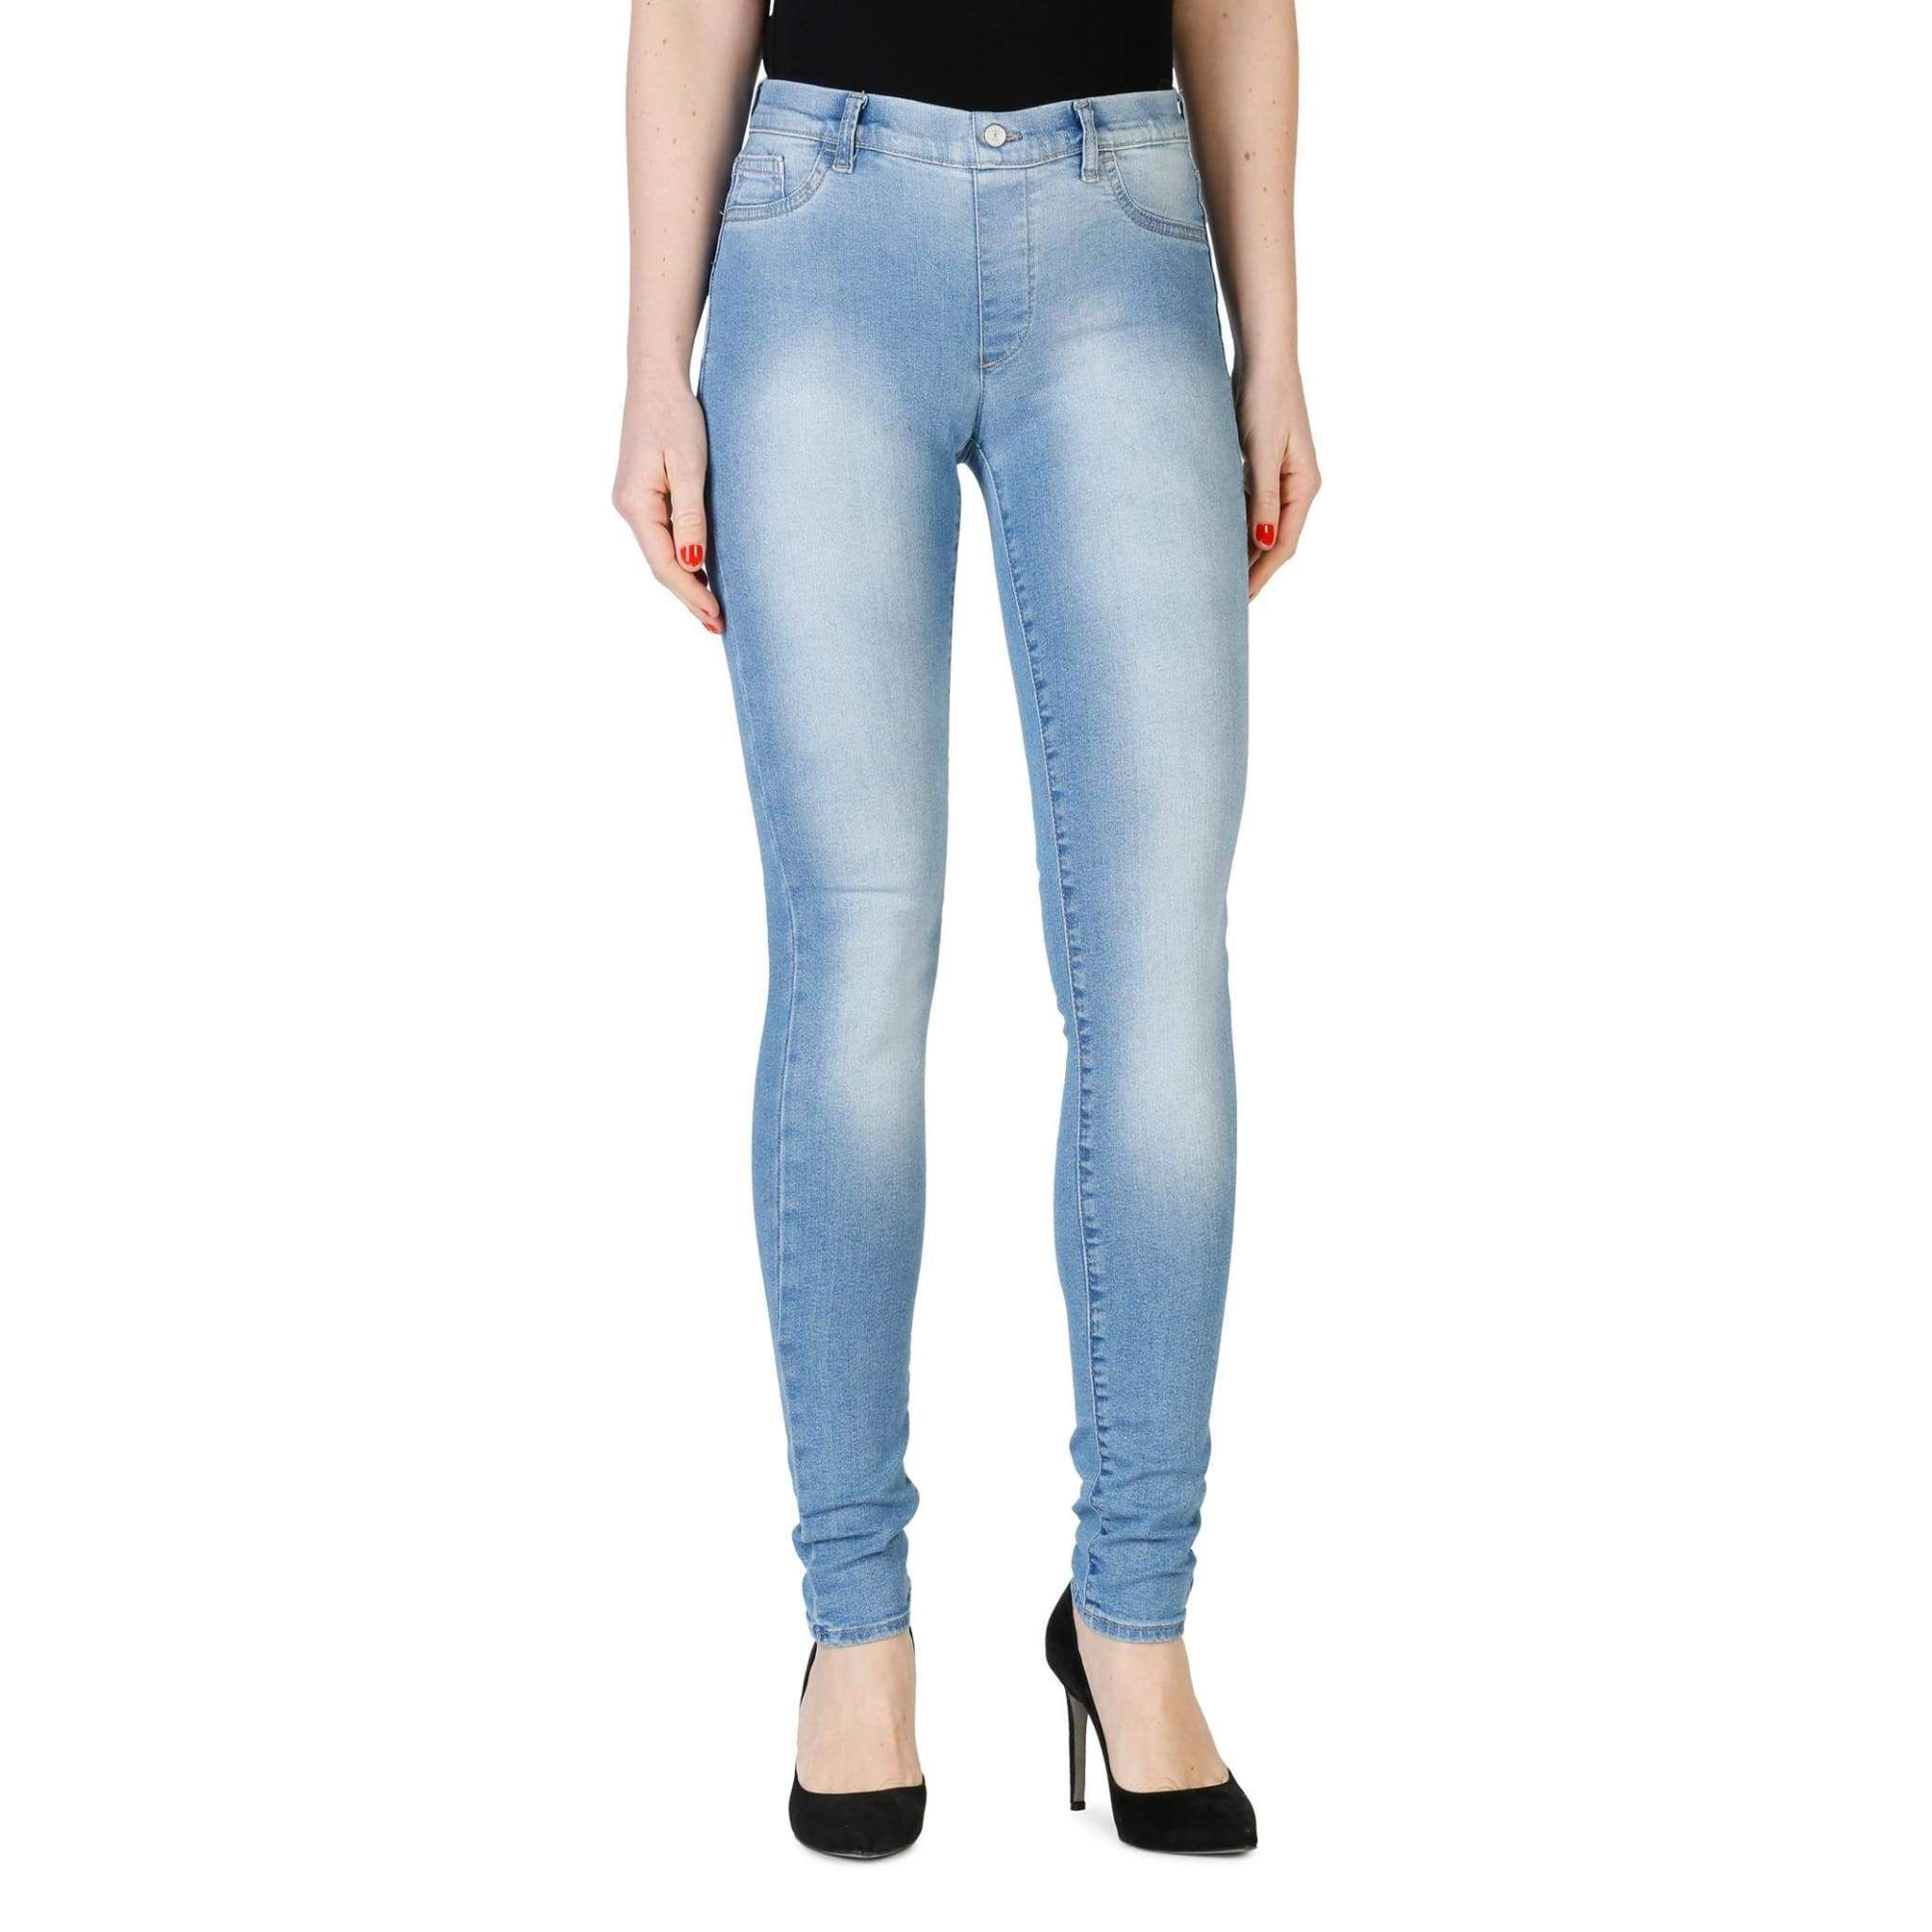 8c698ae8a0 Carrera Jeans Women Blue Jeans | Products | Jeans, Blue Jeans, Denim ...